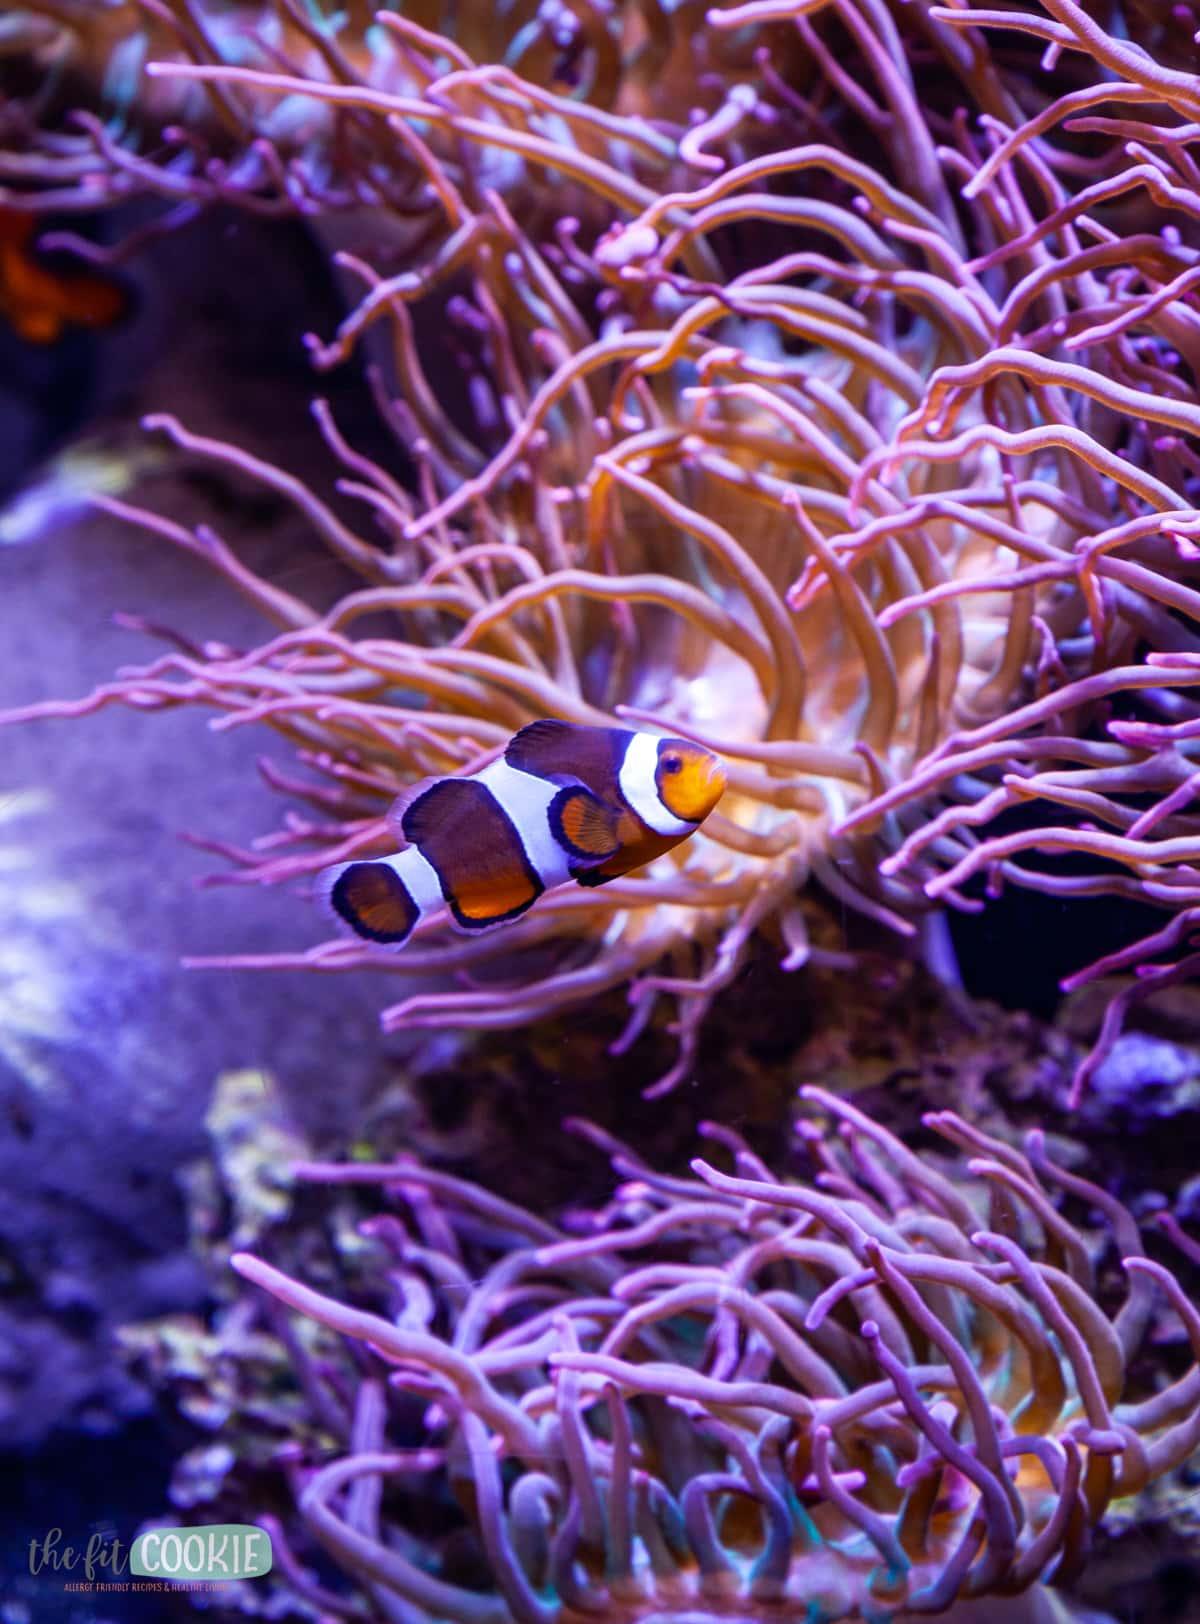 clown fish next to purple anemones